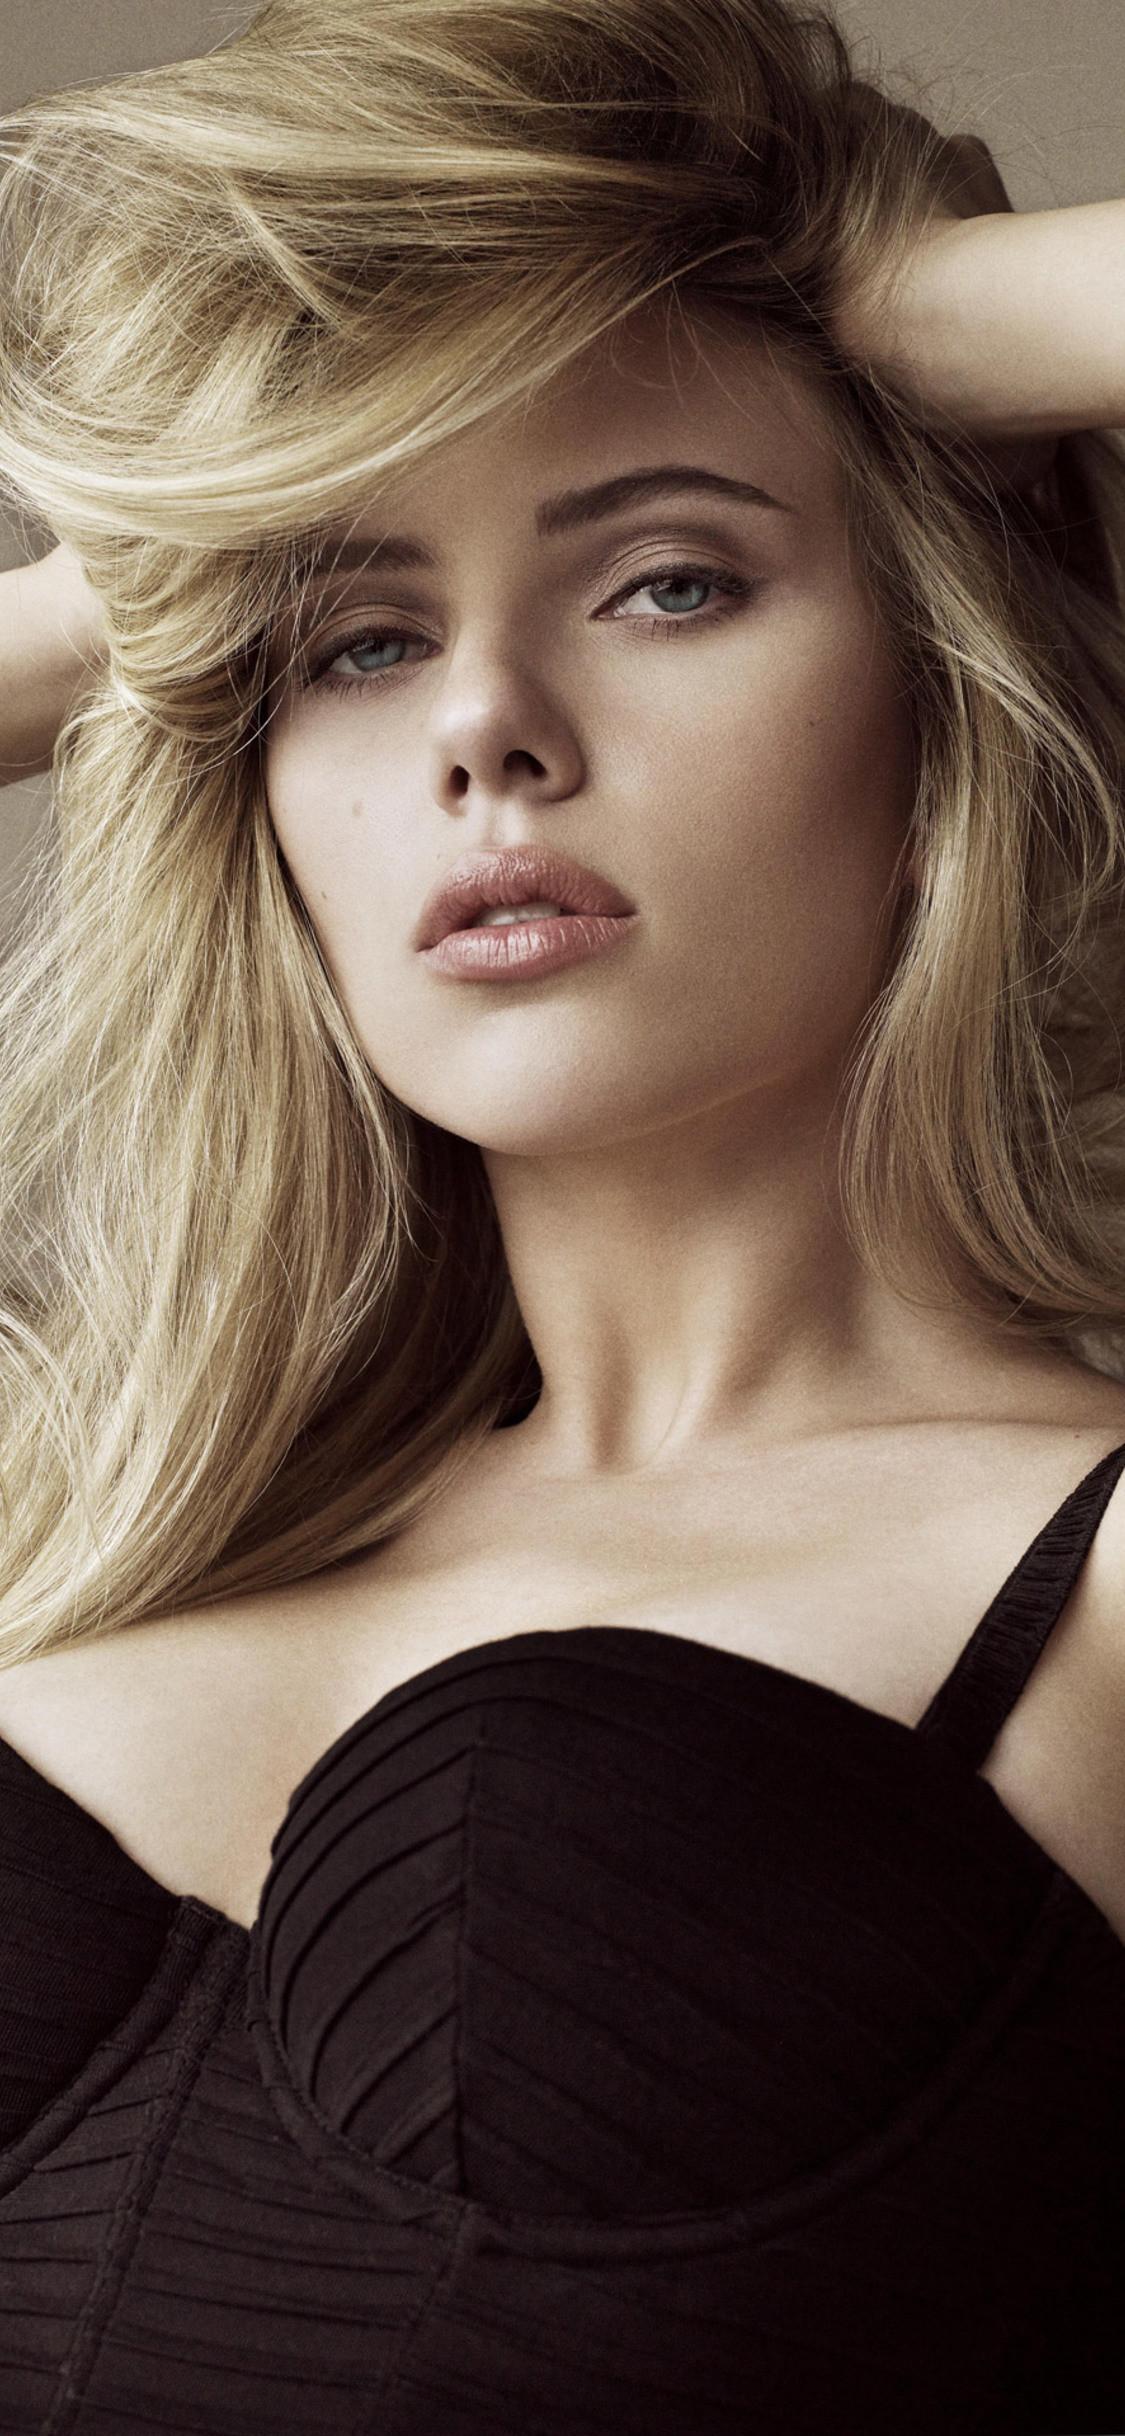 Scarlett Johansson Iphone Wallpaper 88 Images